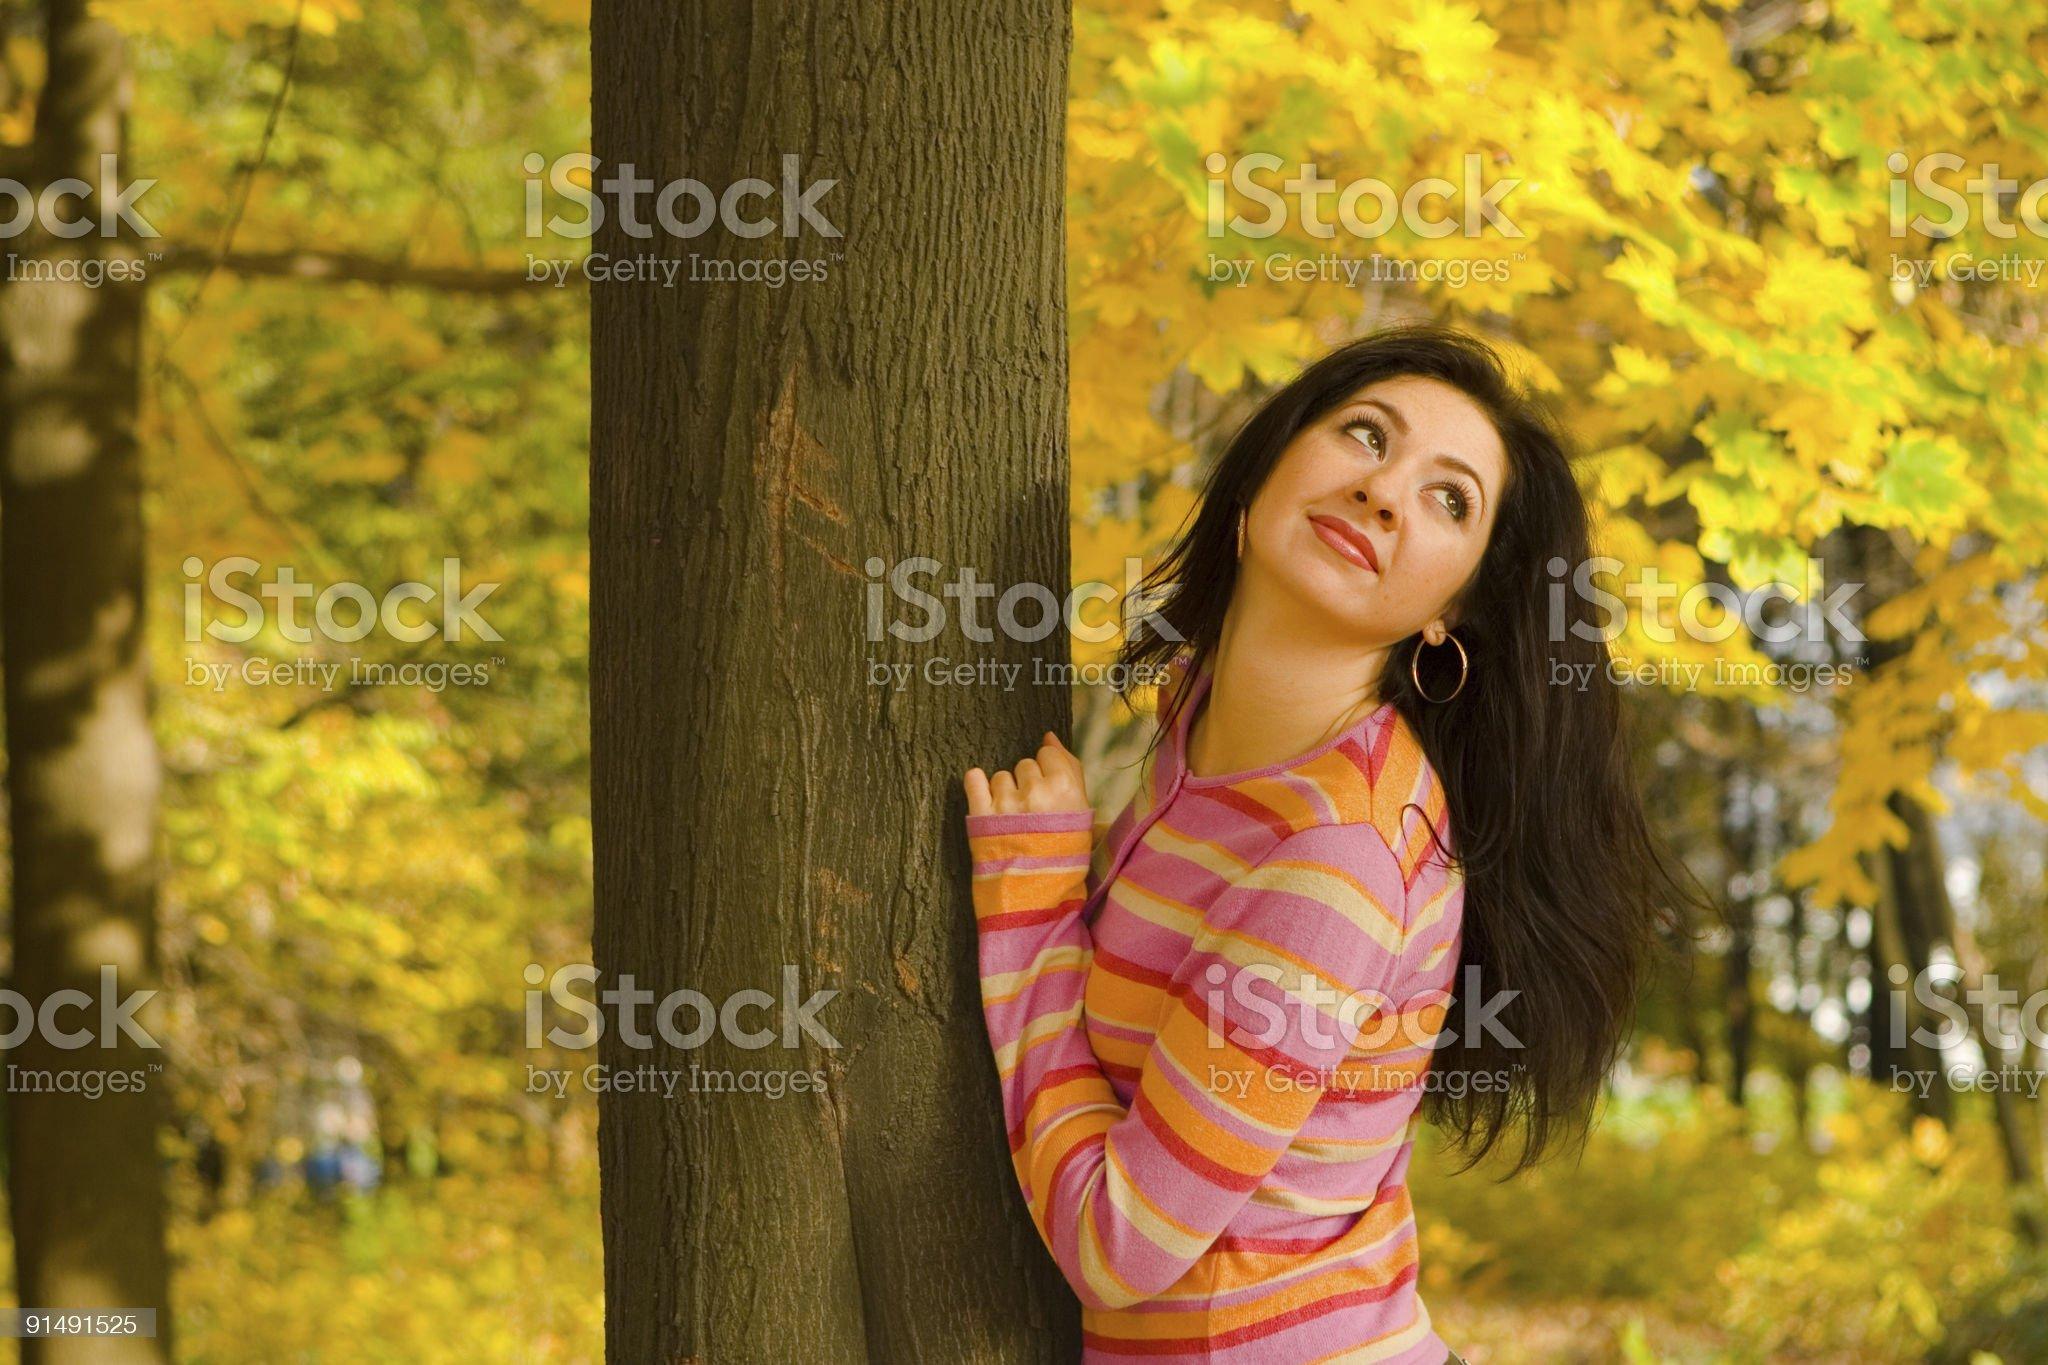 autmun fashion girl portrait royalty-free stock photo